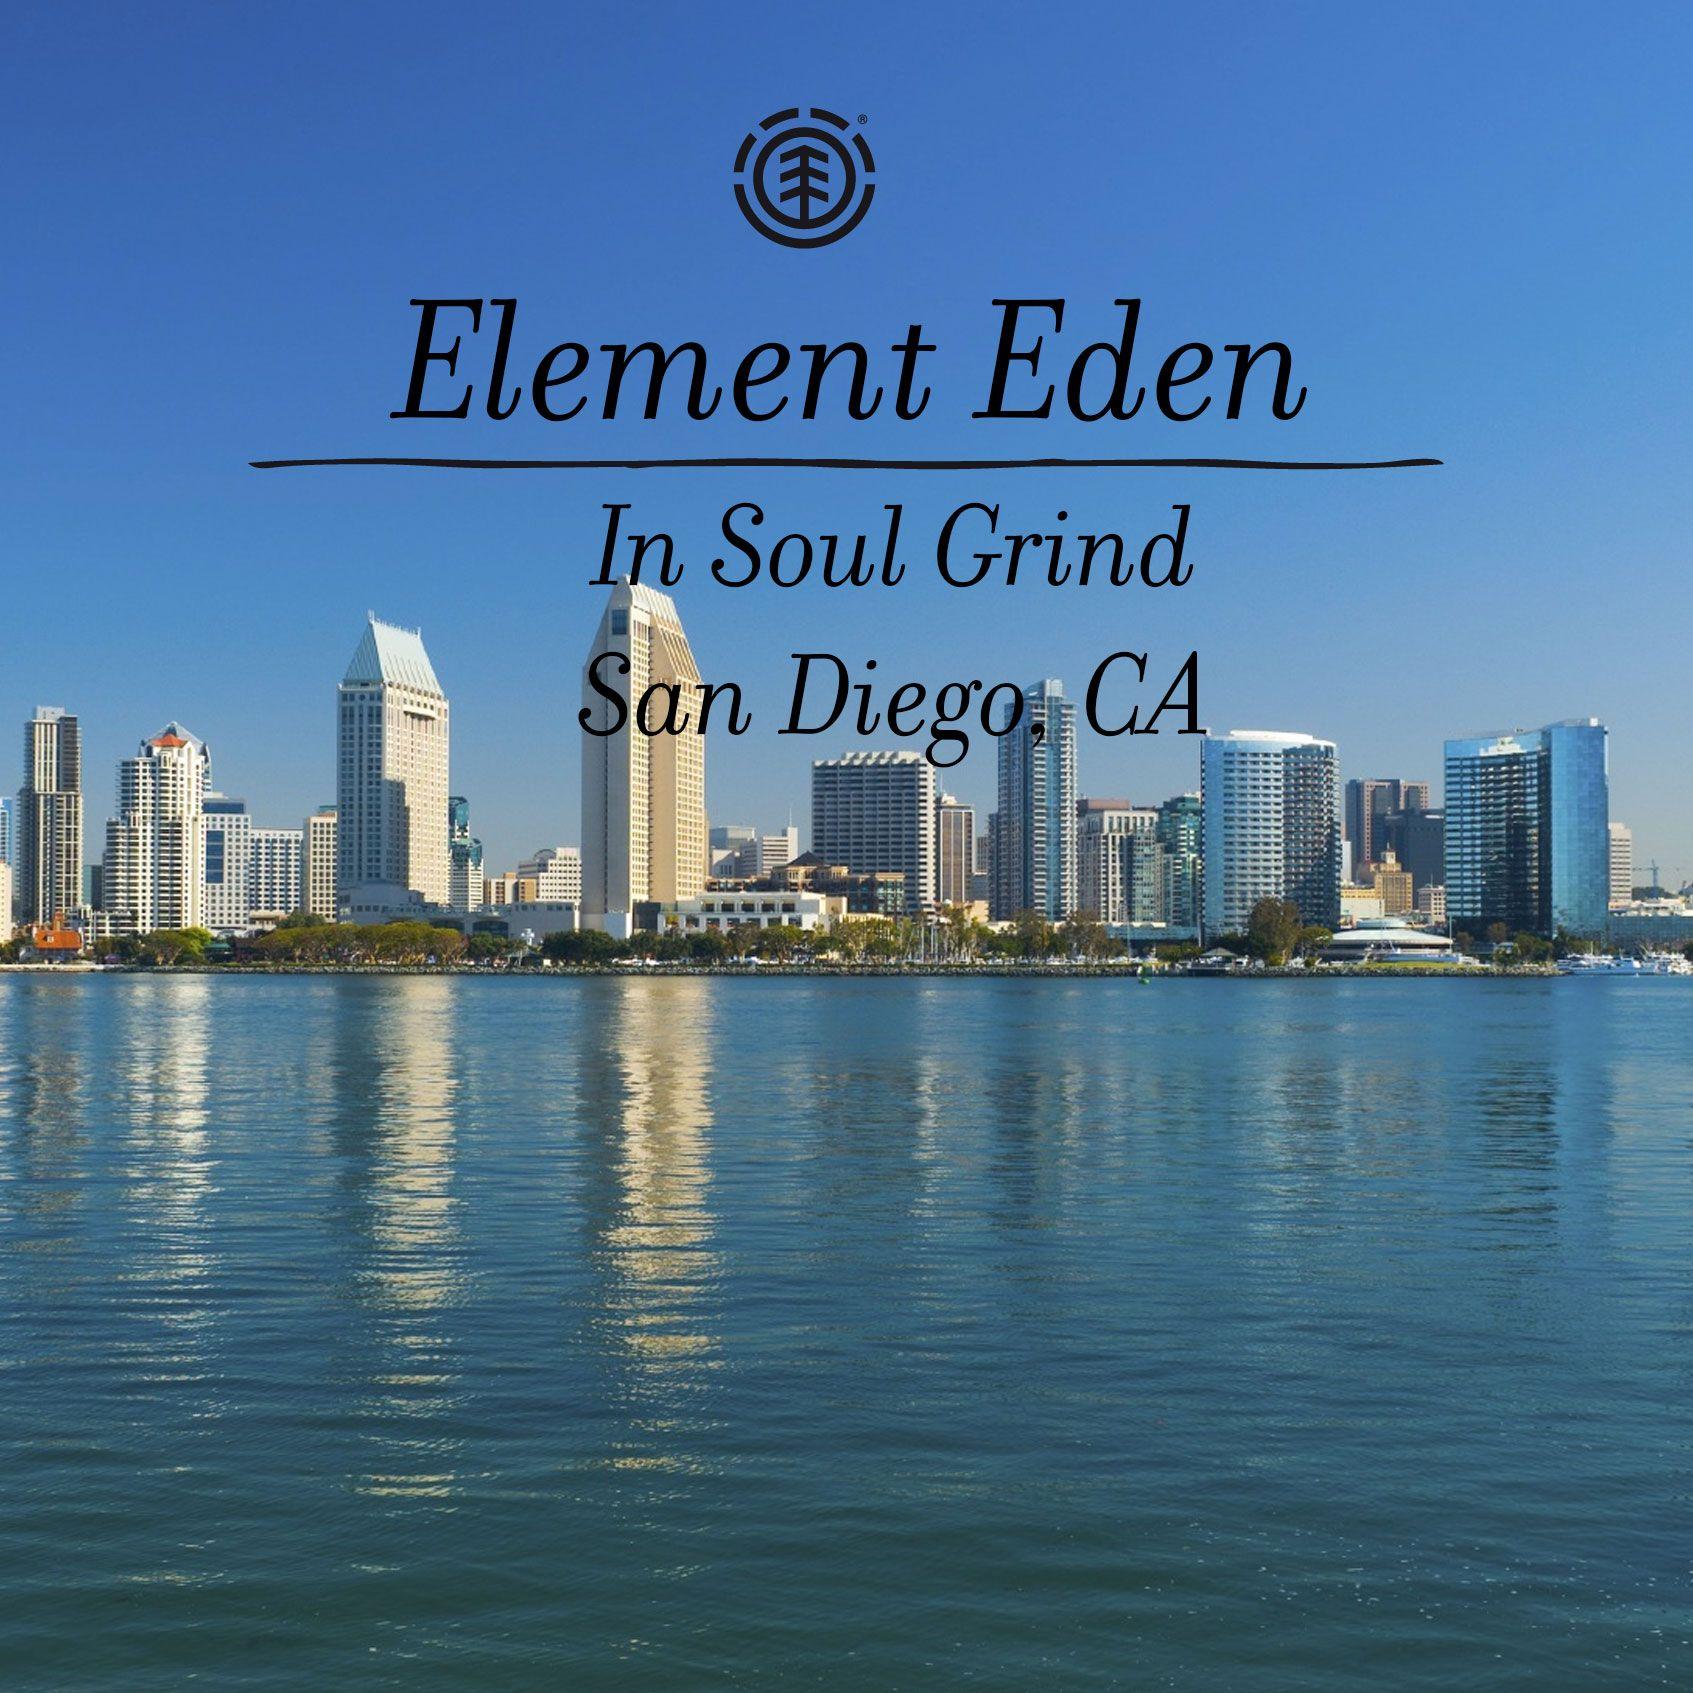 Find your favorite Element Eden outfits at Soul Grind in San Diego, CA #elementeden #livelearngrow @elementeden >>> http://us.shop.elementeden.com/w/womens/new-arrivals